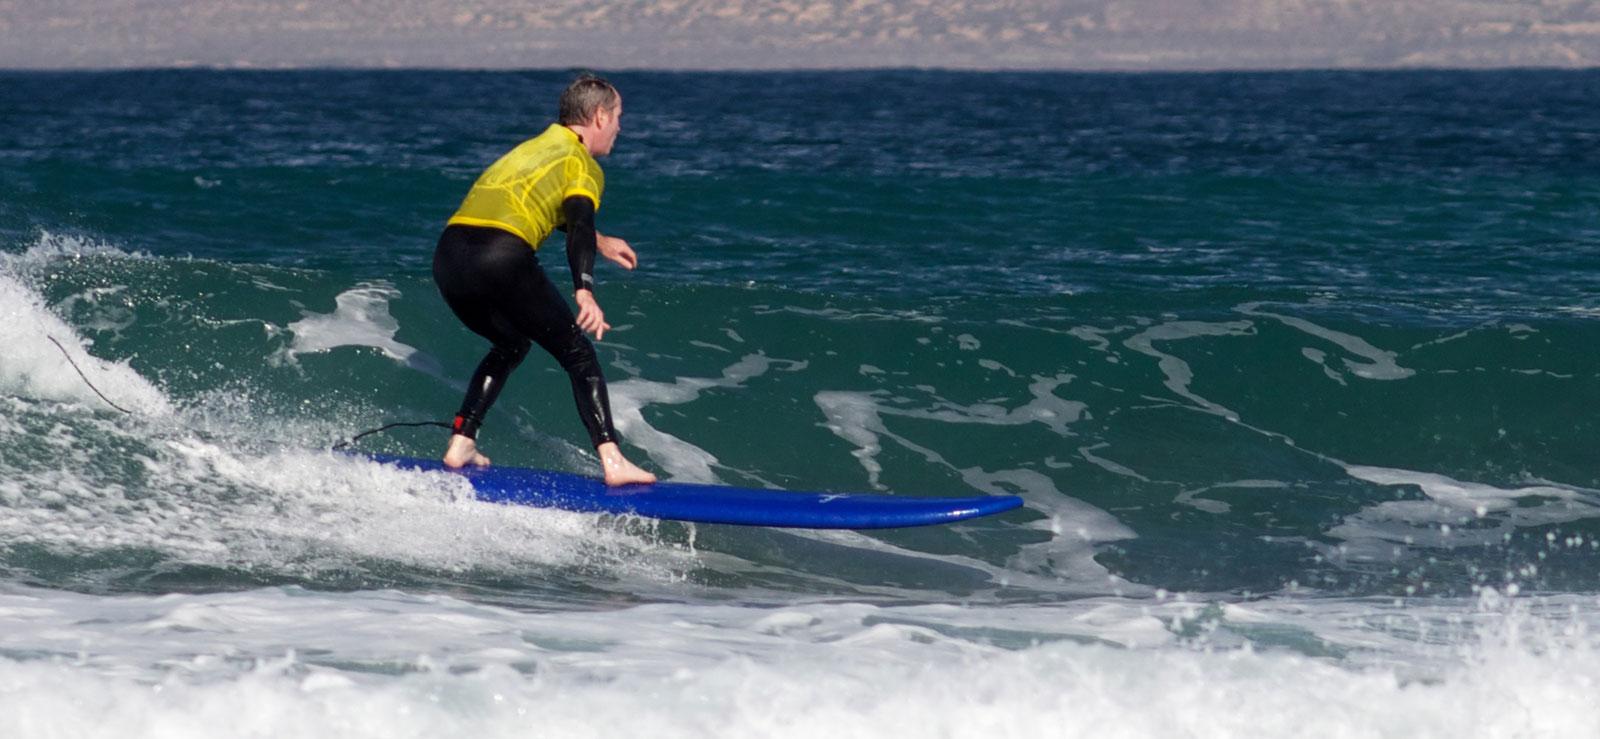 riding unbroken waves